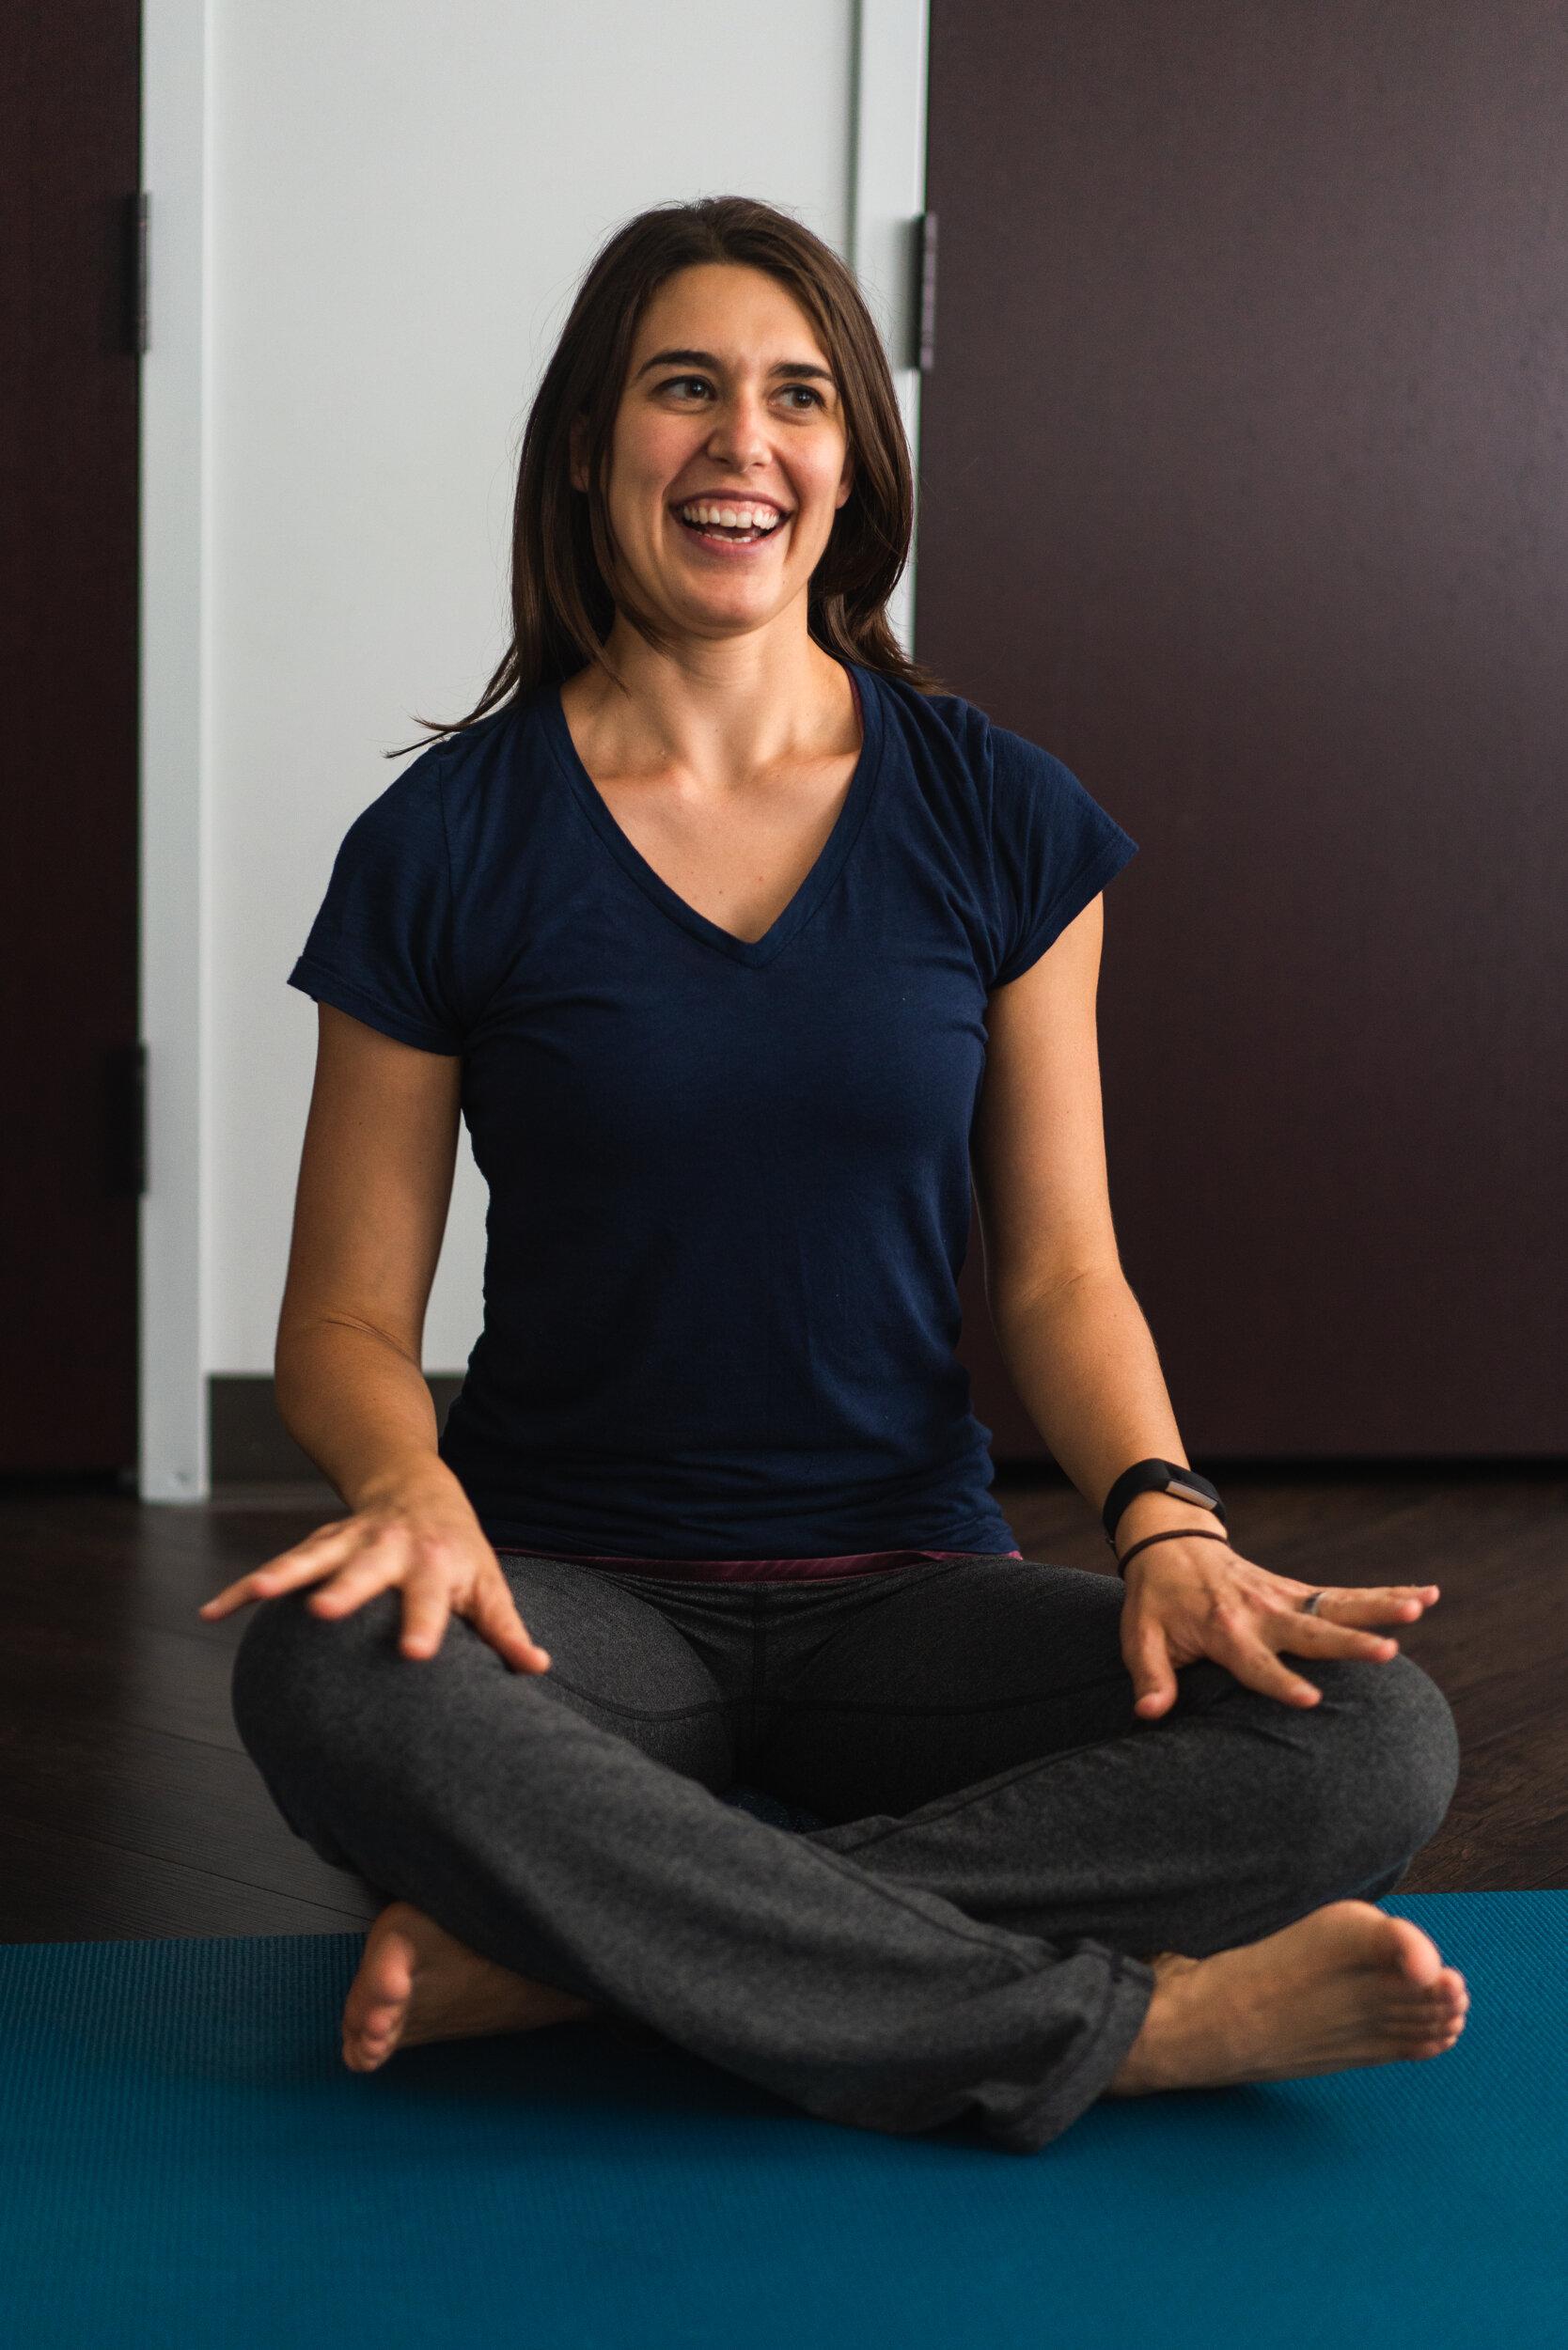 Renee Zambo, Yoga Teacher and Yoga Therapist